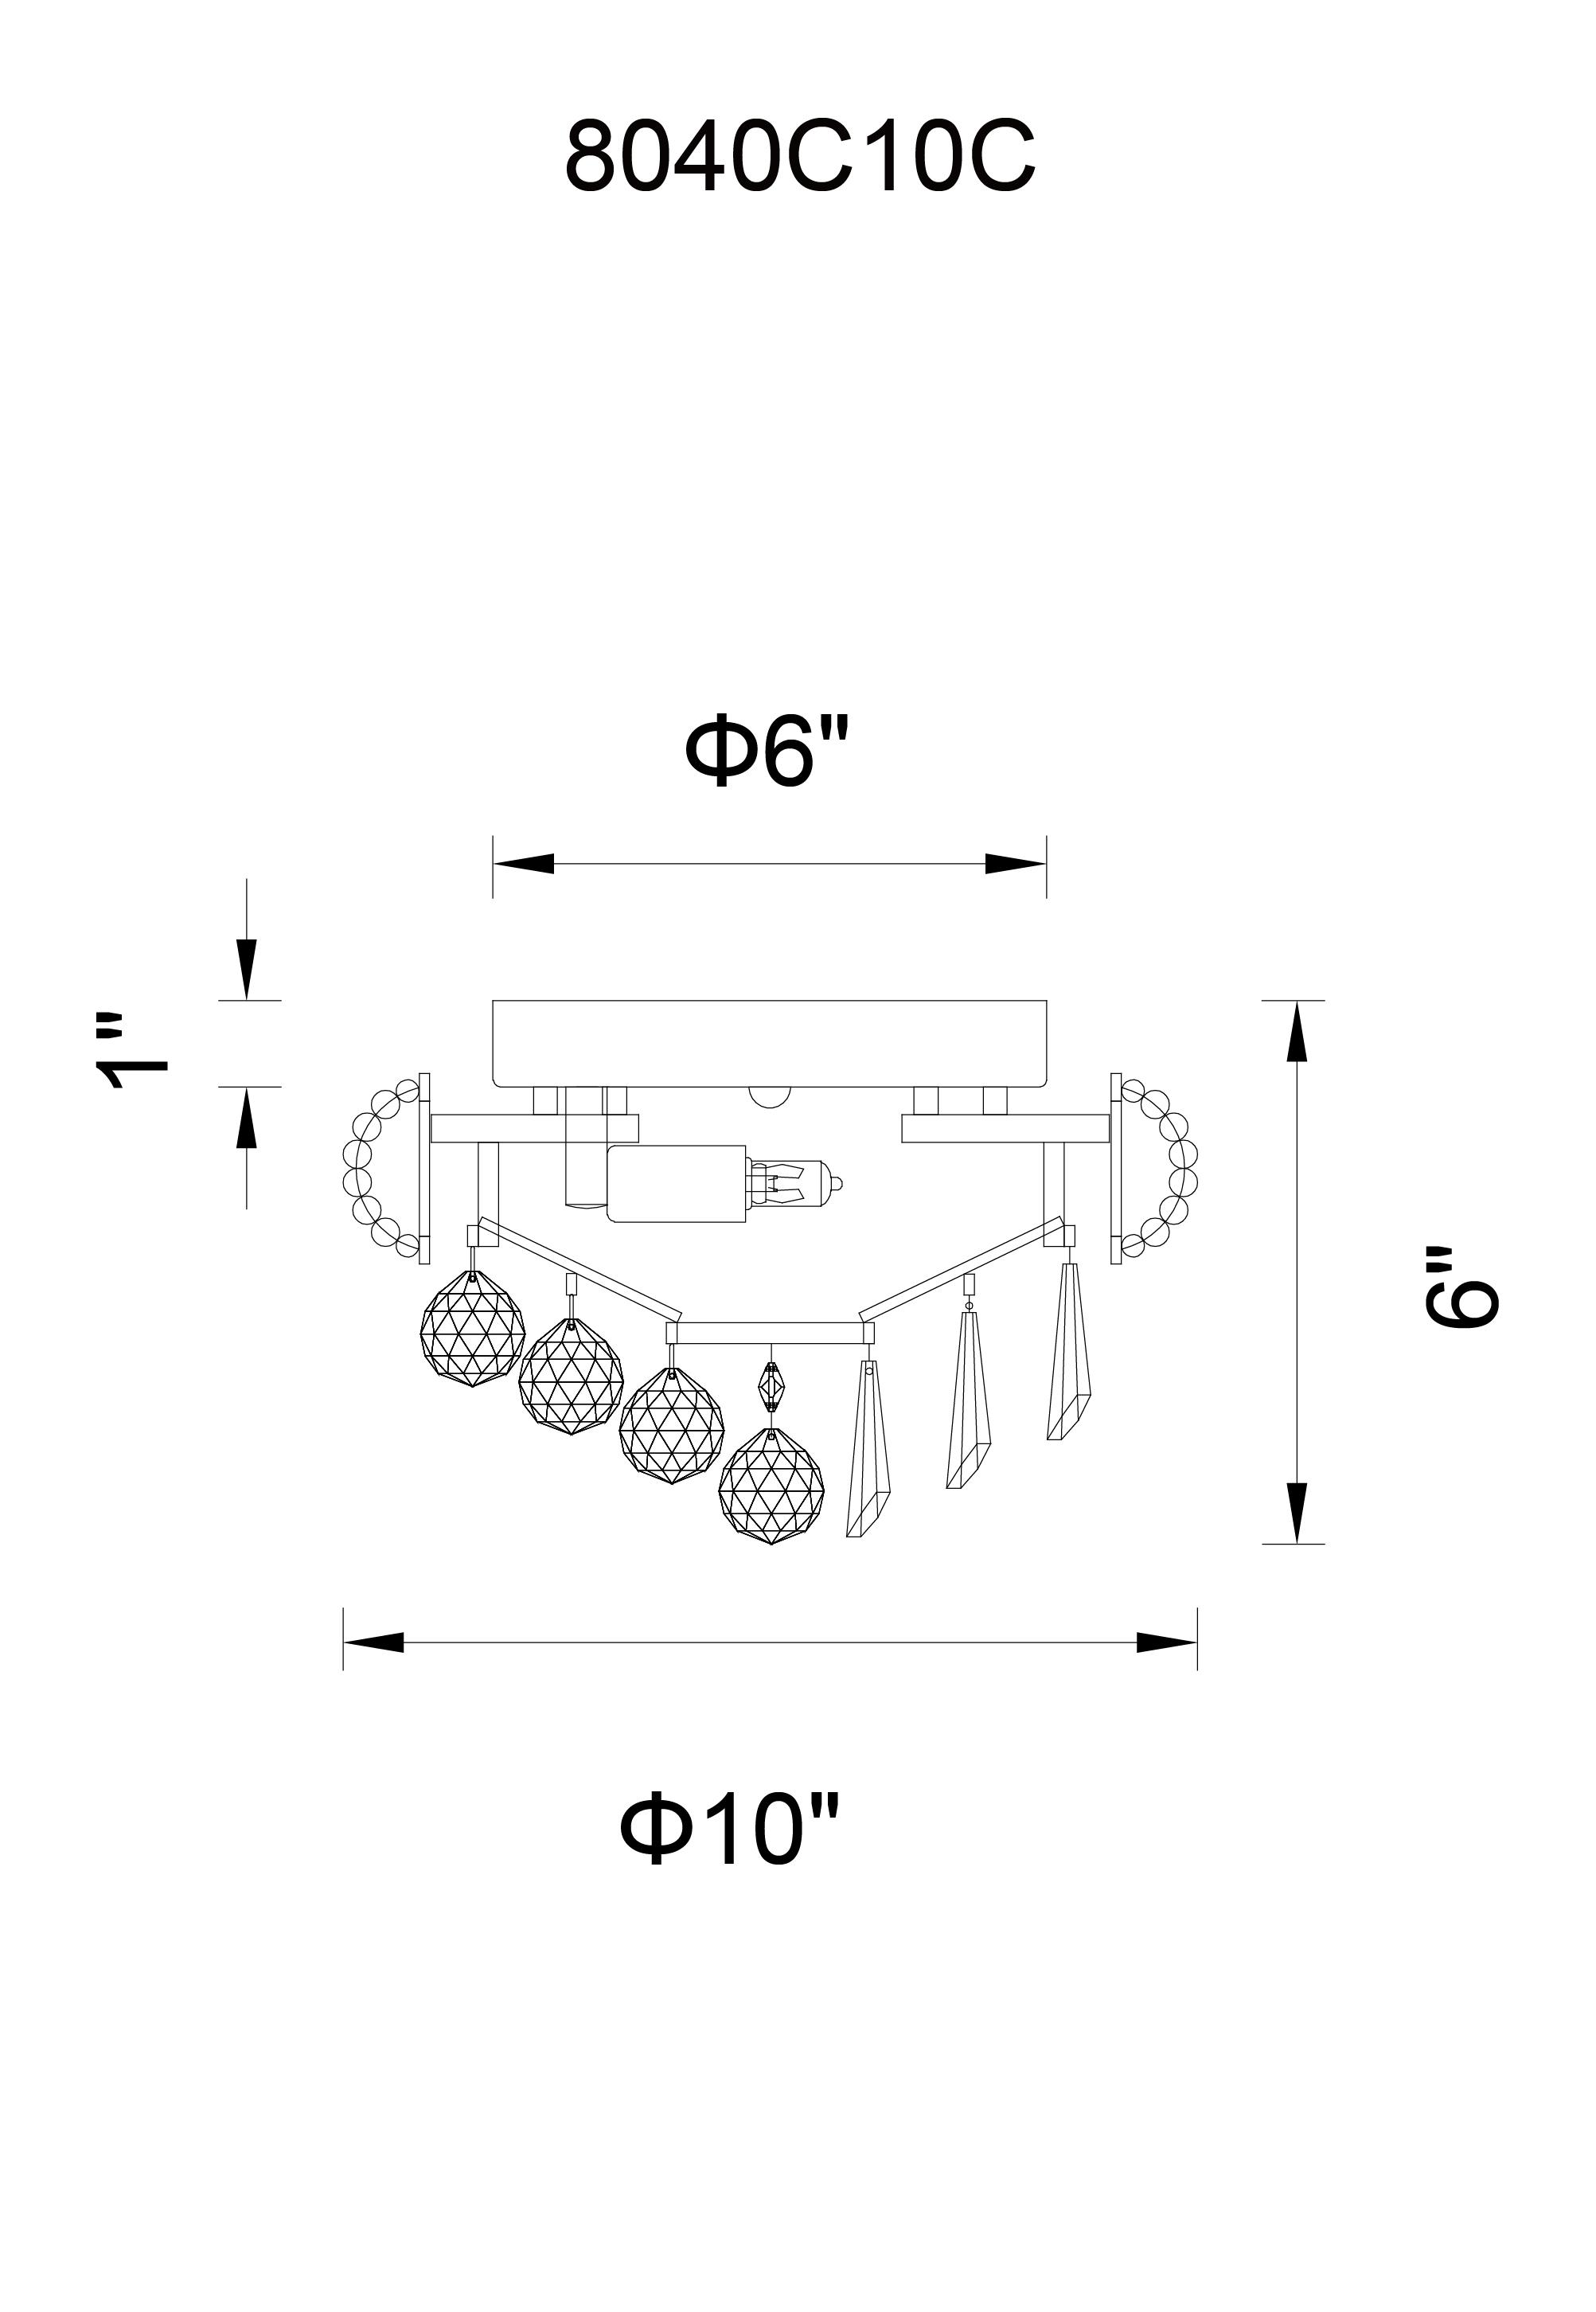 CWI Lighting Kingdom 2 Light Flush Mount With Chrome Finish Model: 8040C10C Line Drawing